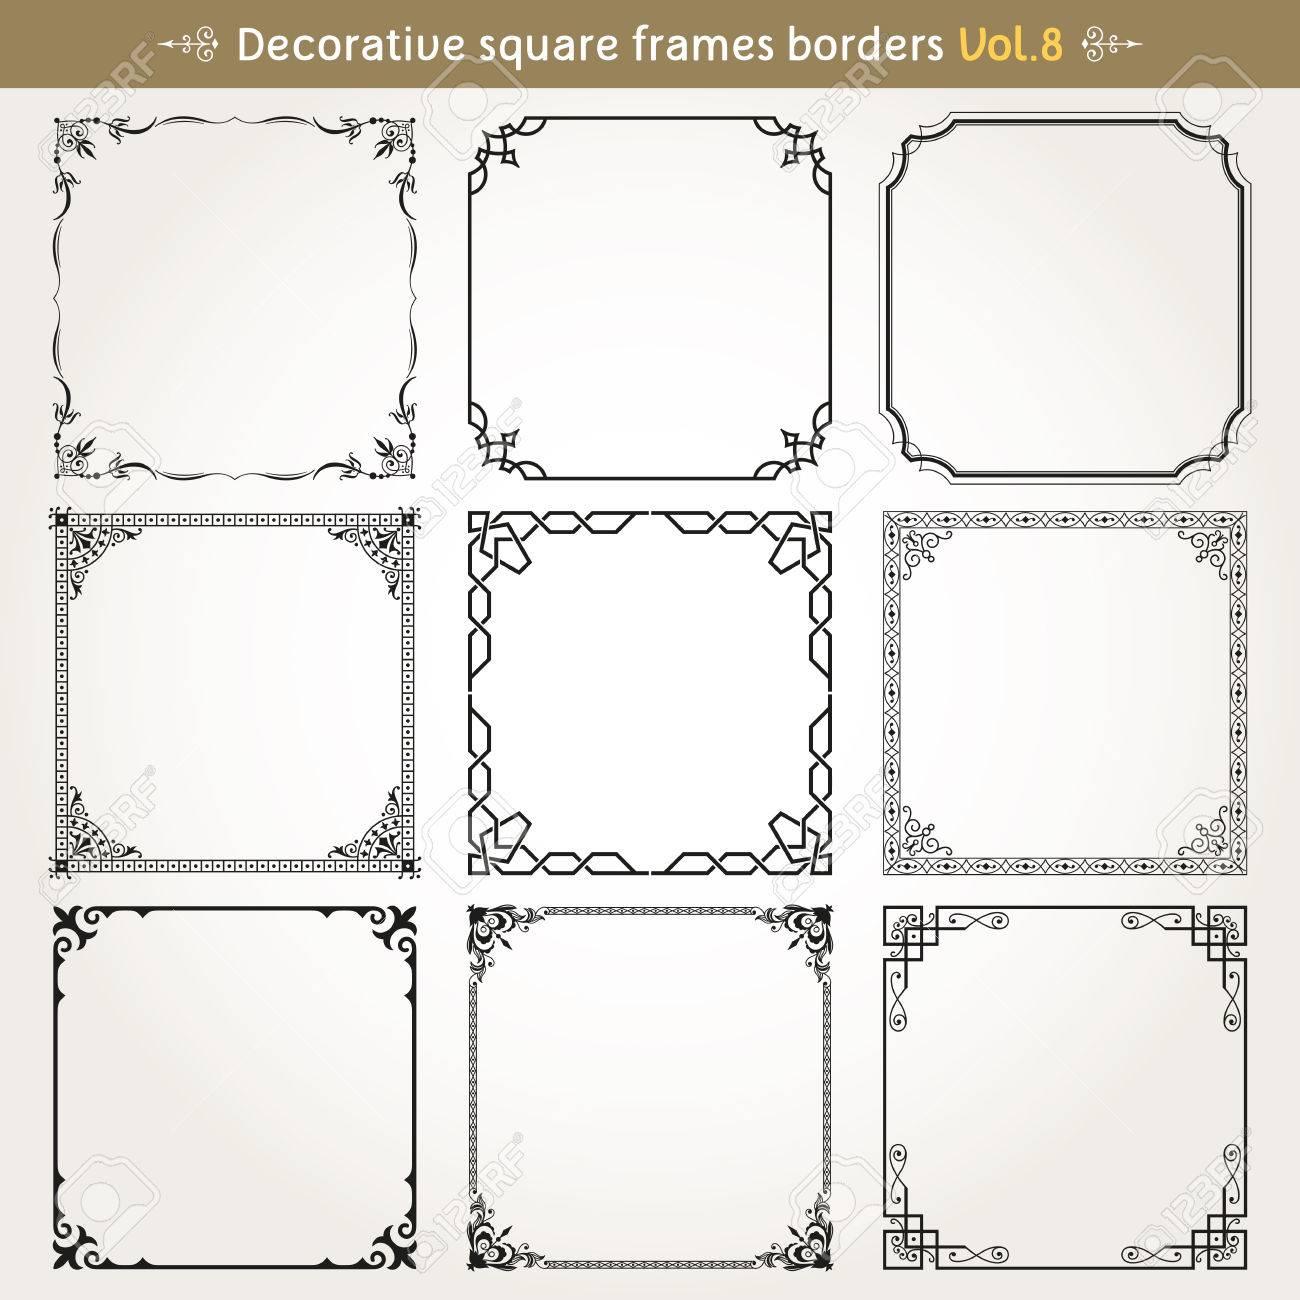 Dekorative Quadratische Rahmen Grenzen Hintergründe Design-Elemente ...